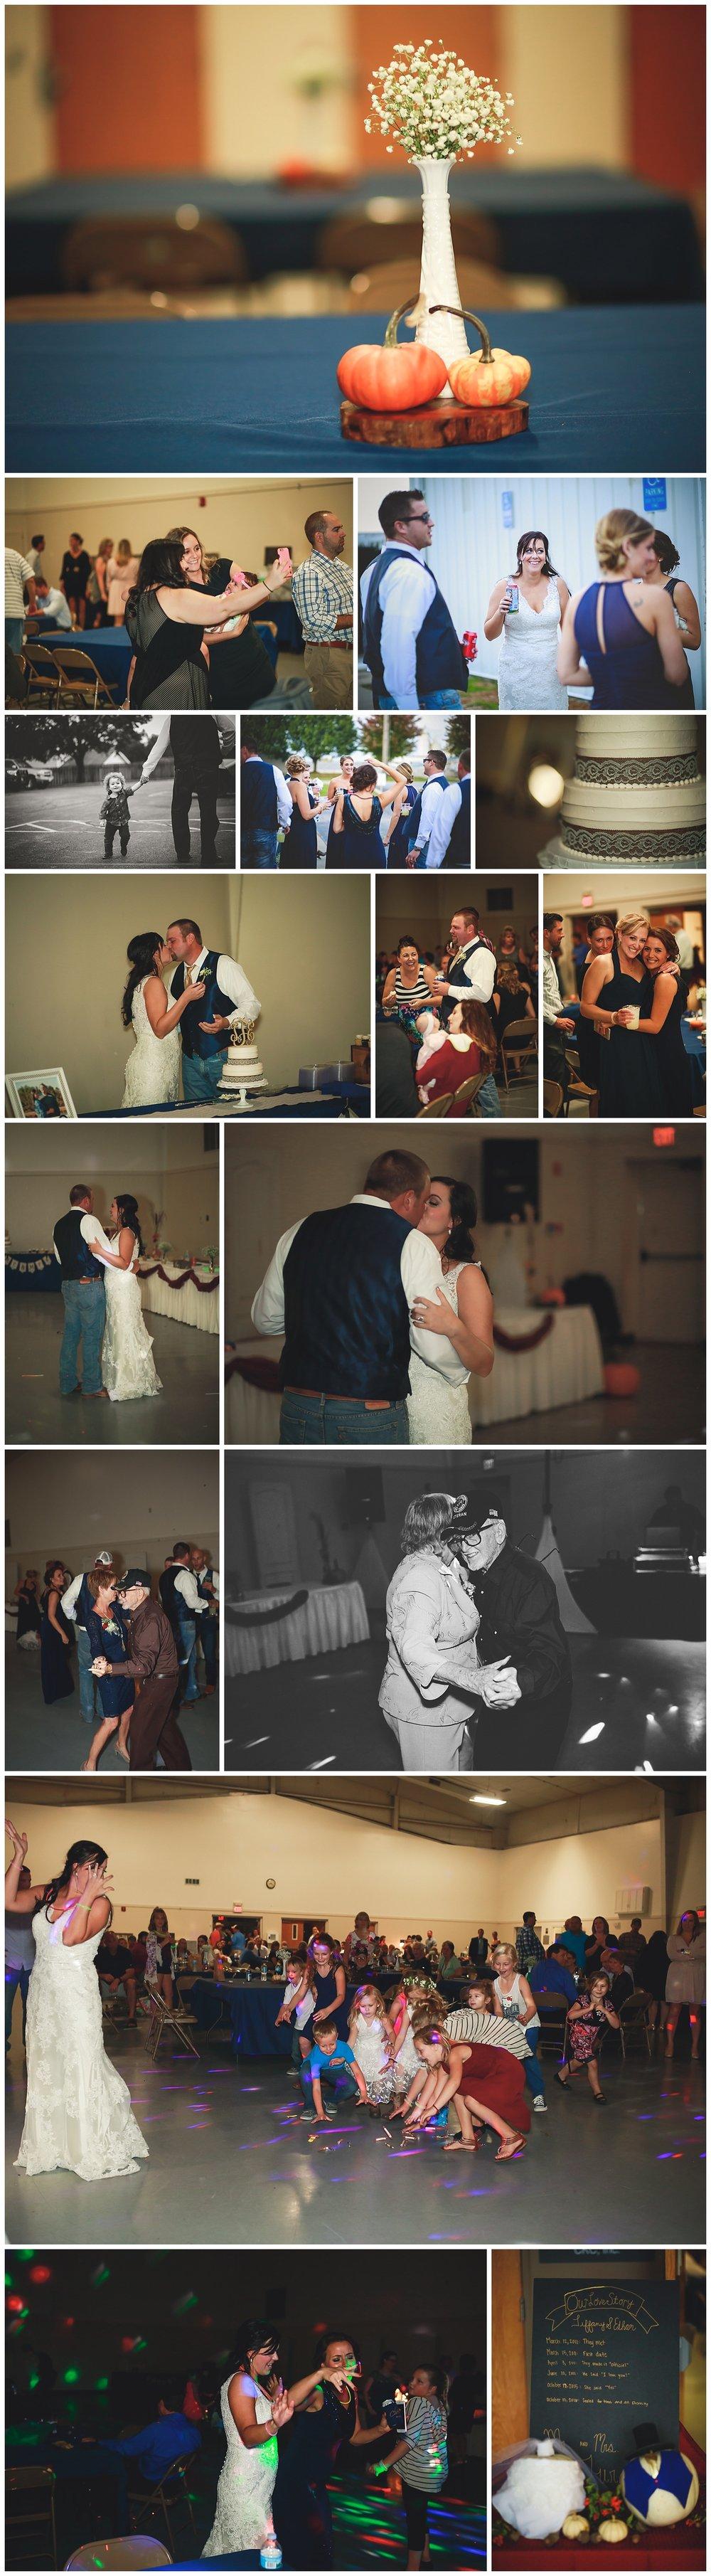 Wedding photographer columbia missouri